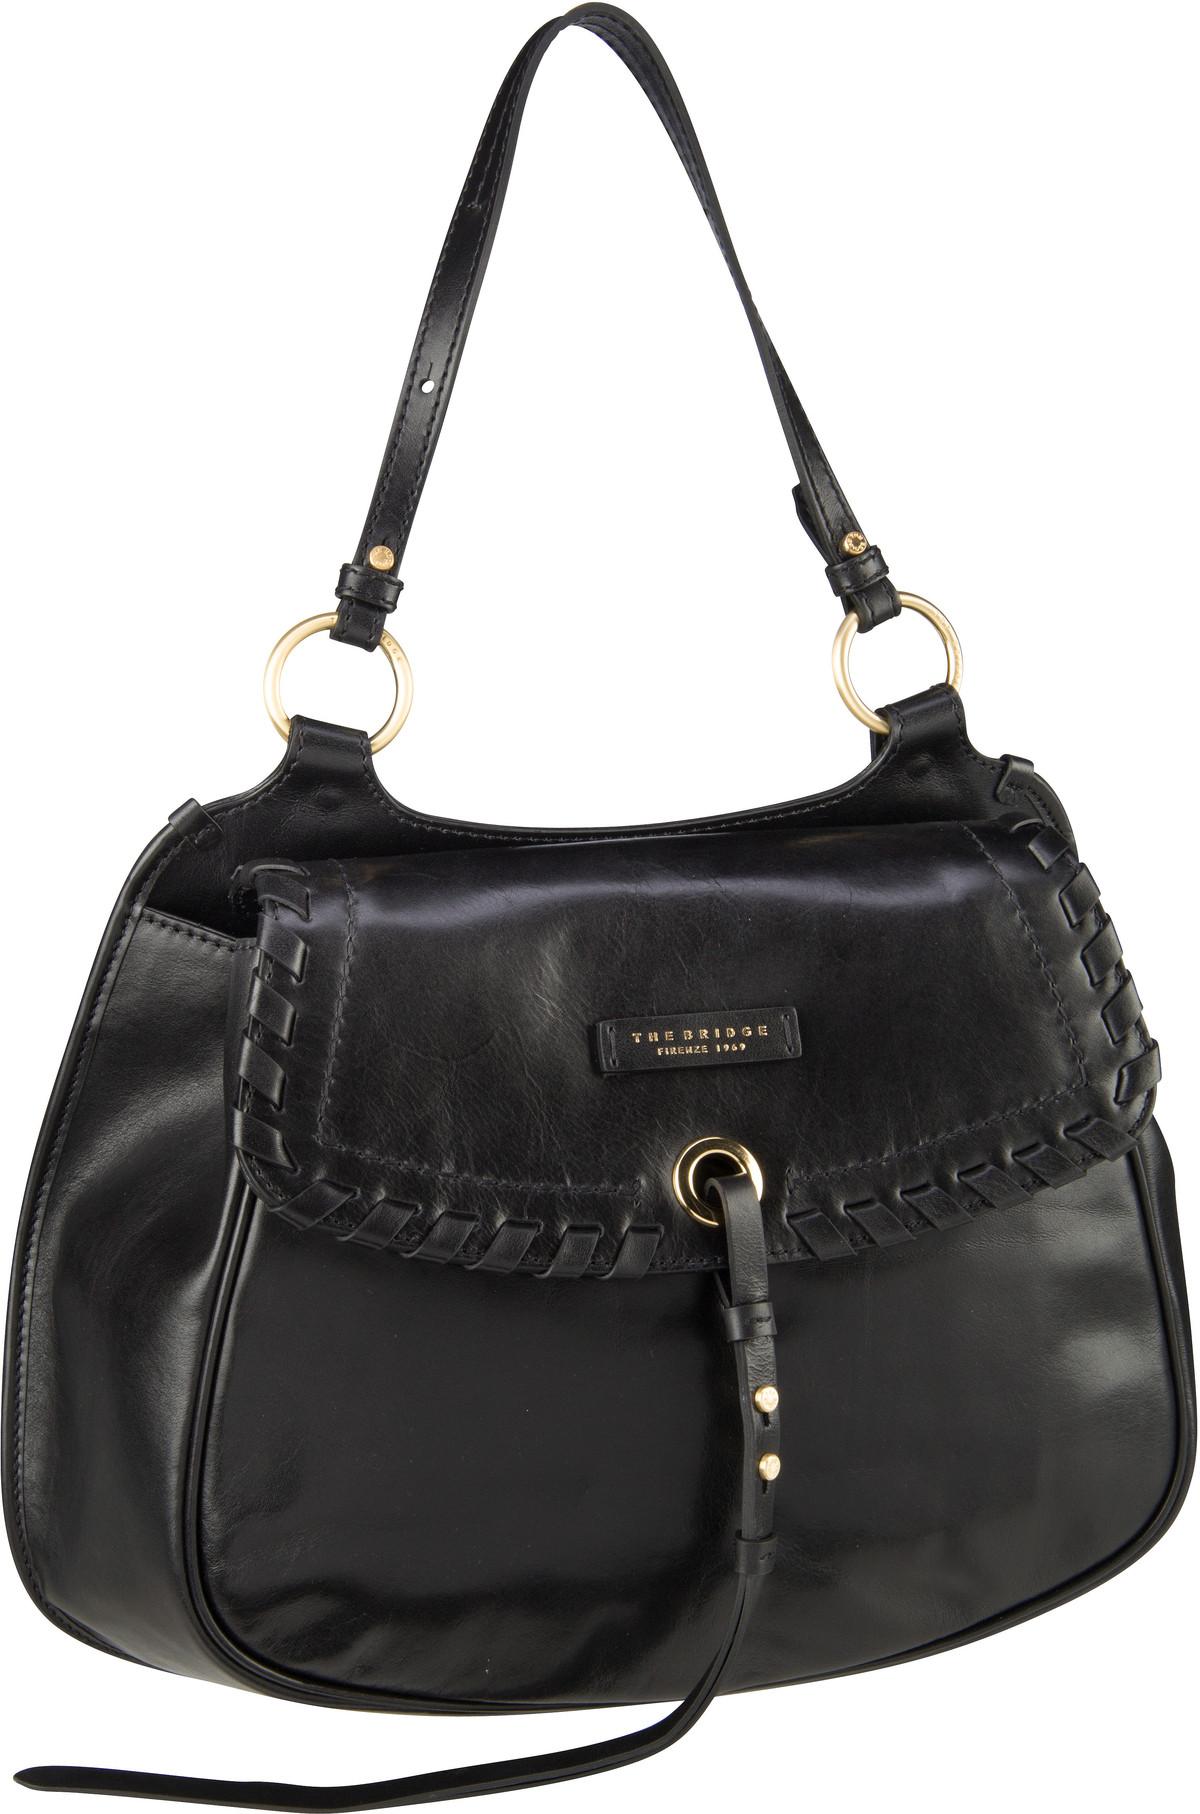 Handtasche Vallombrosa Shopper 5939 Nero/Oro